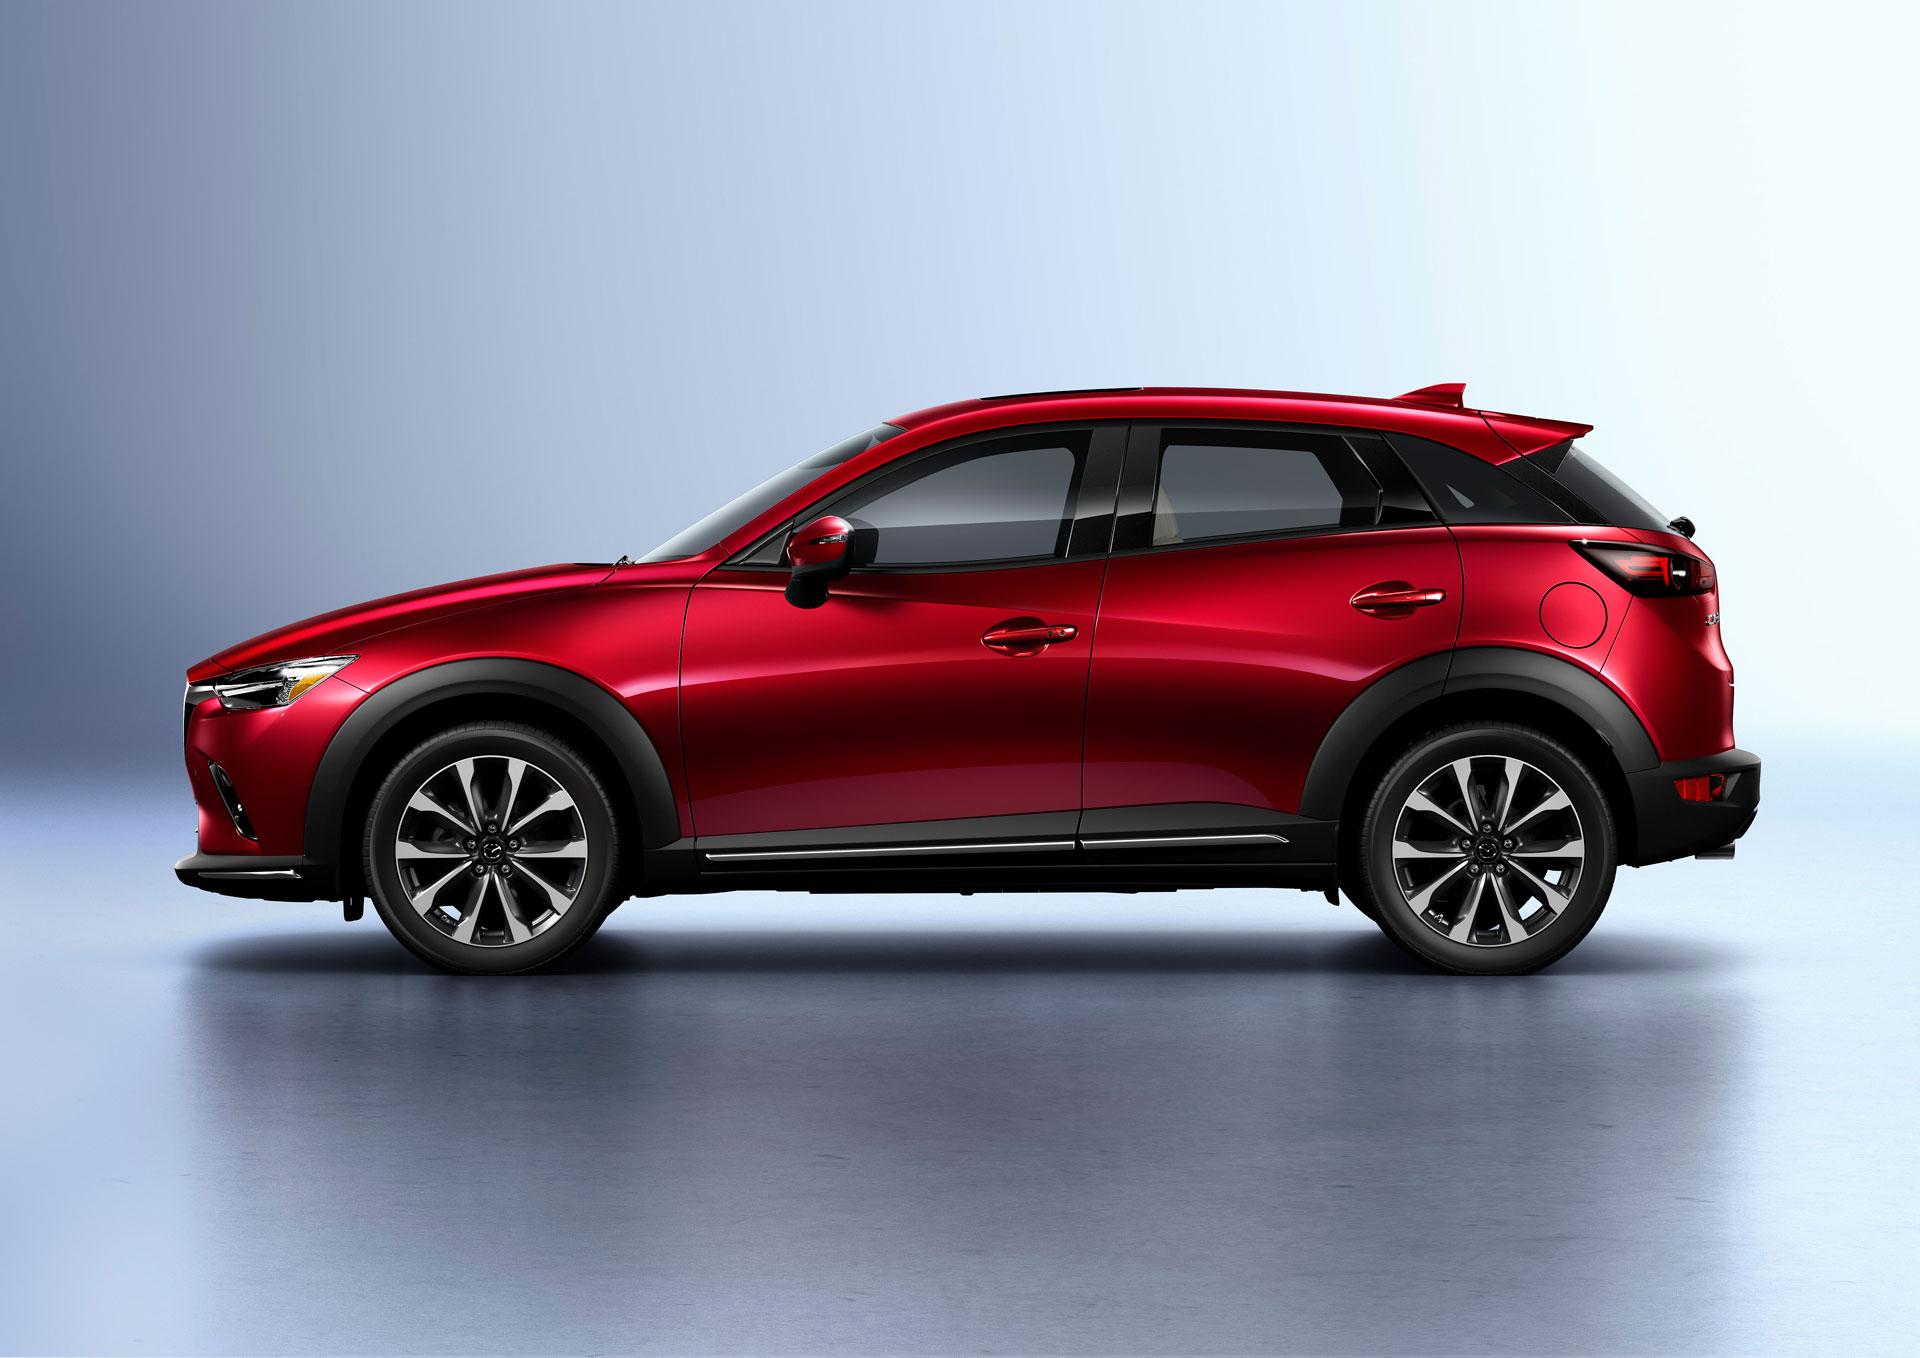 2020 Mazda Cx 3 Redesign